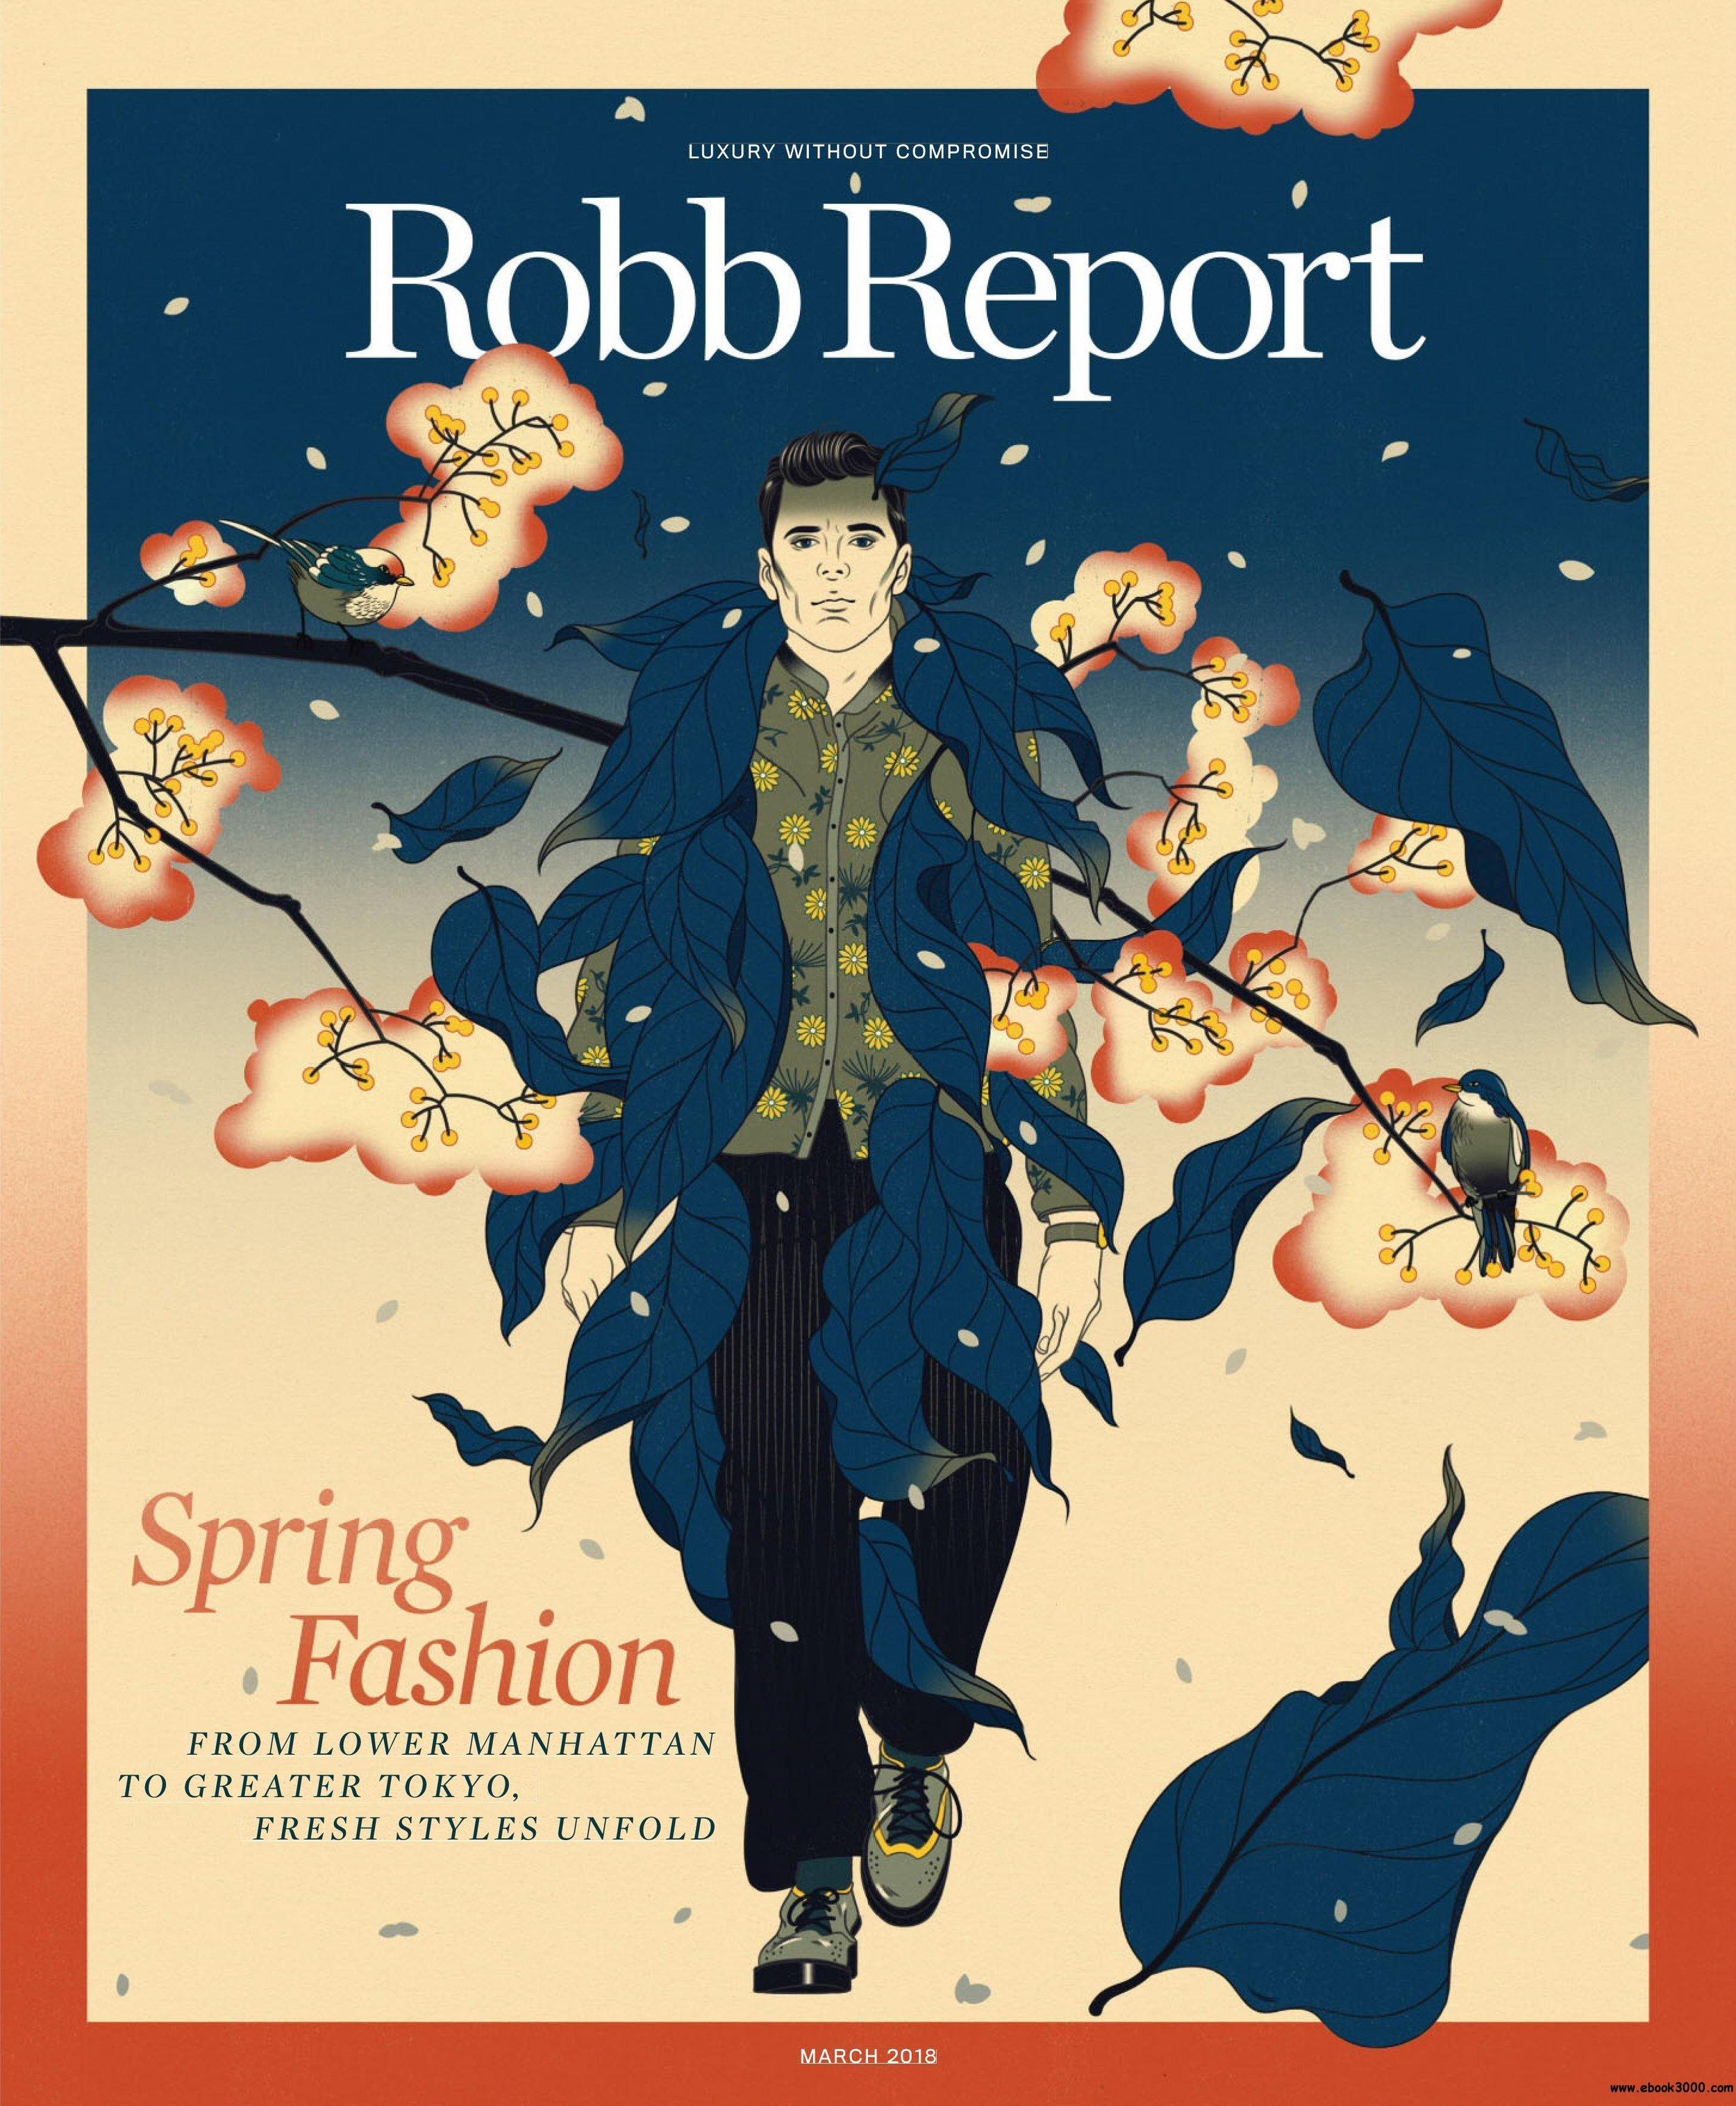 Robb Report Magazine Cover